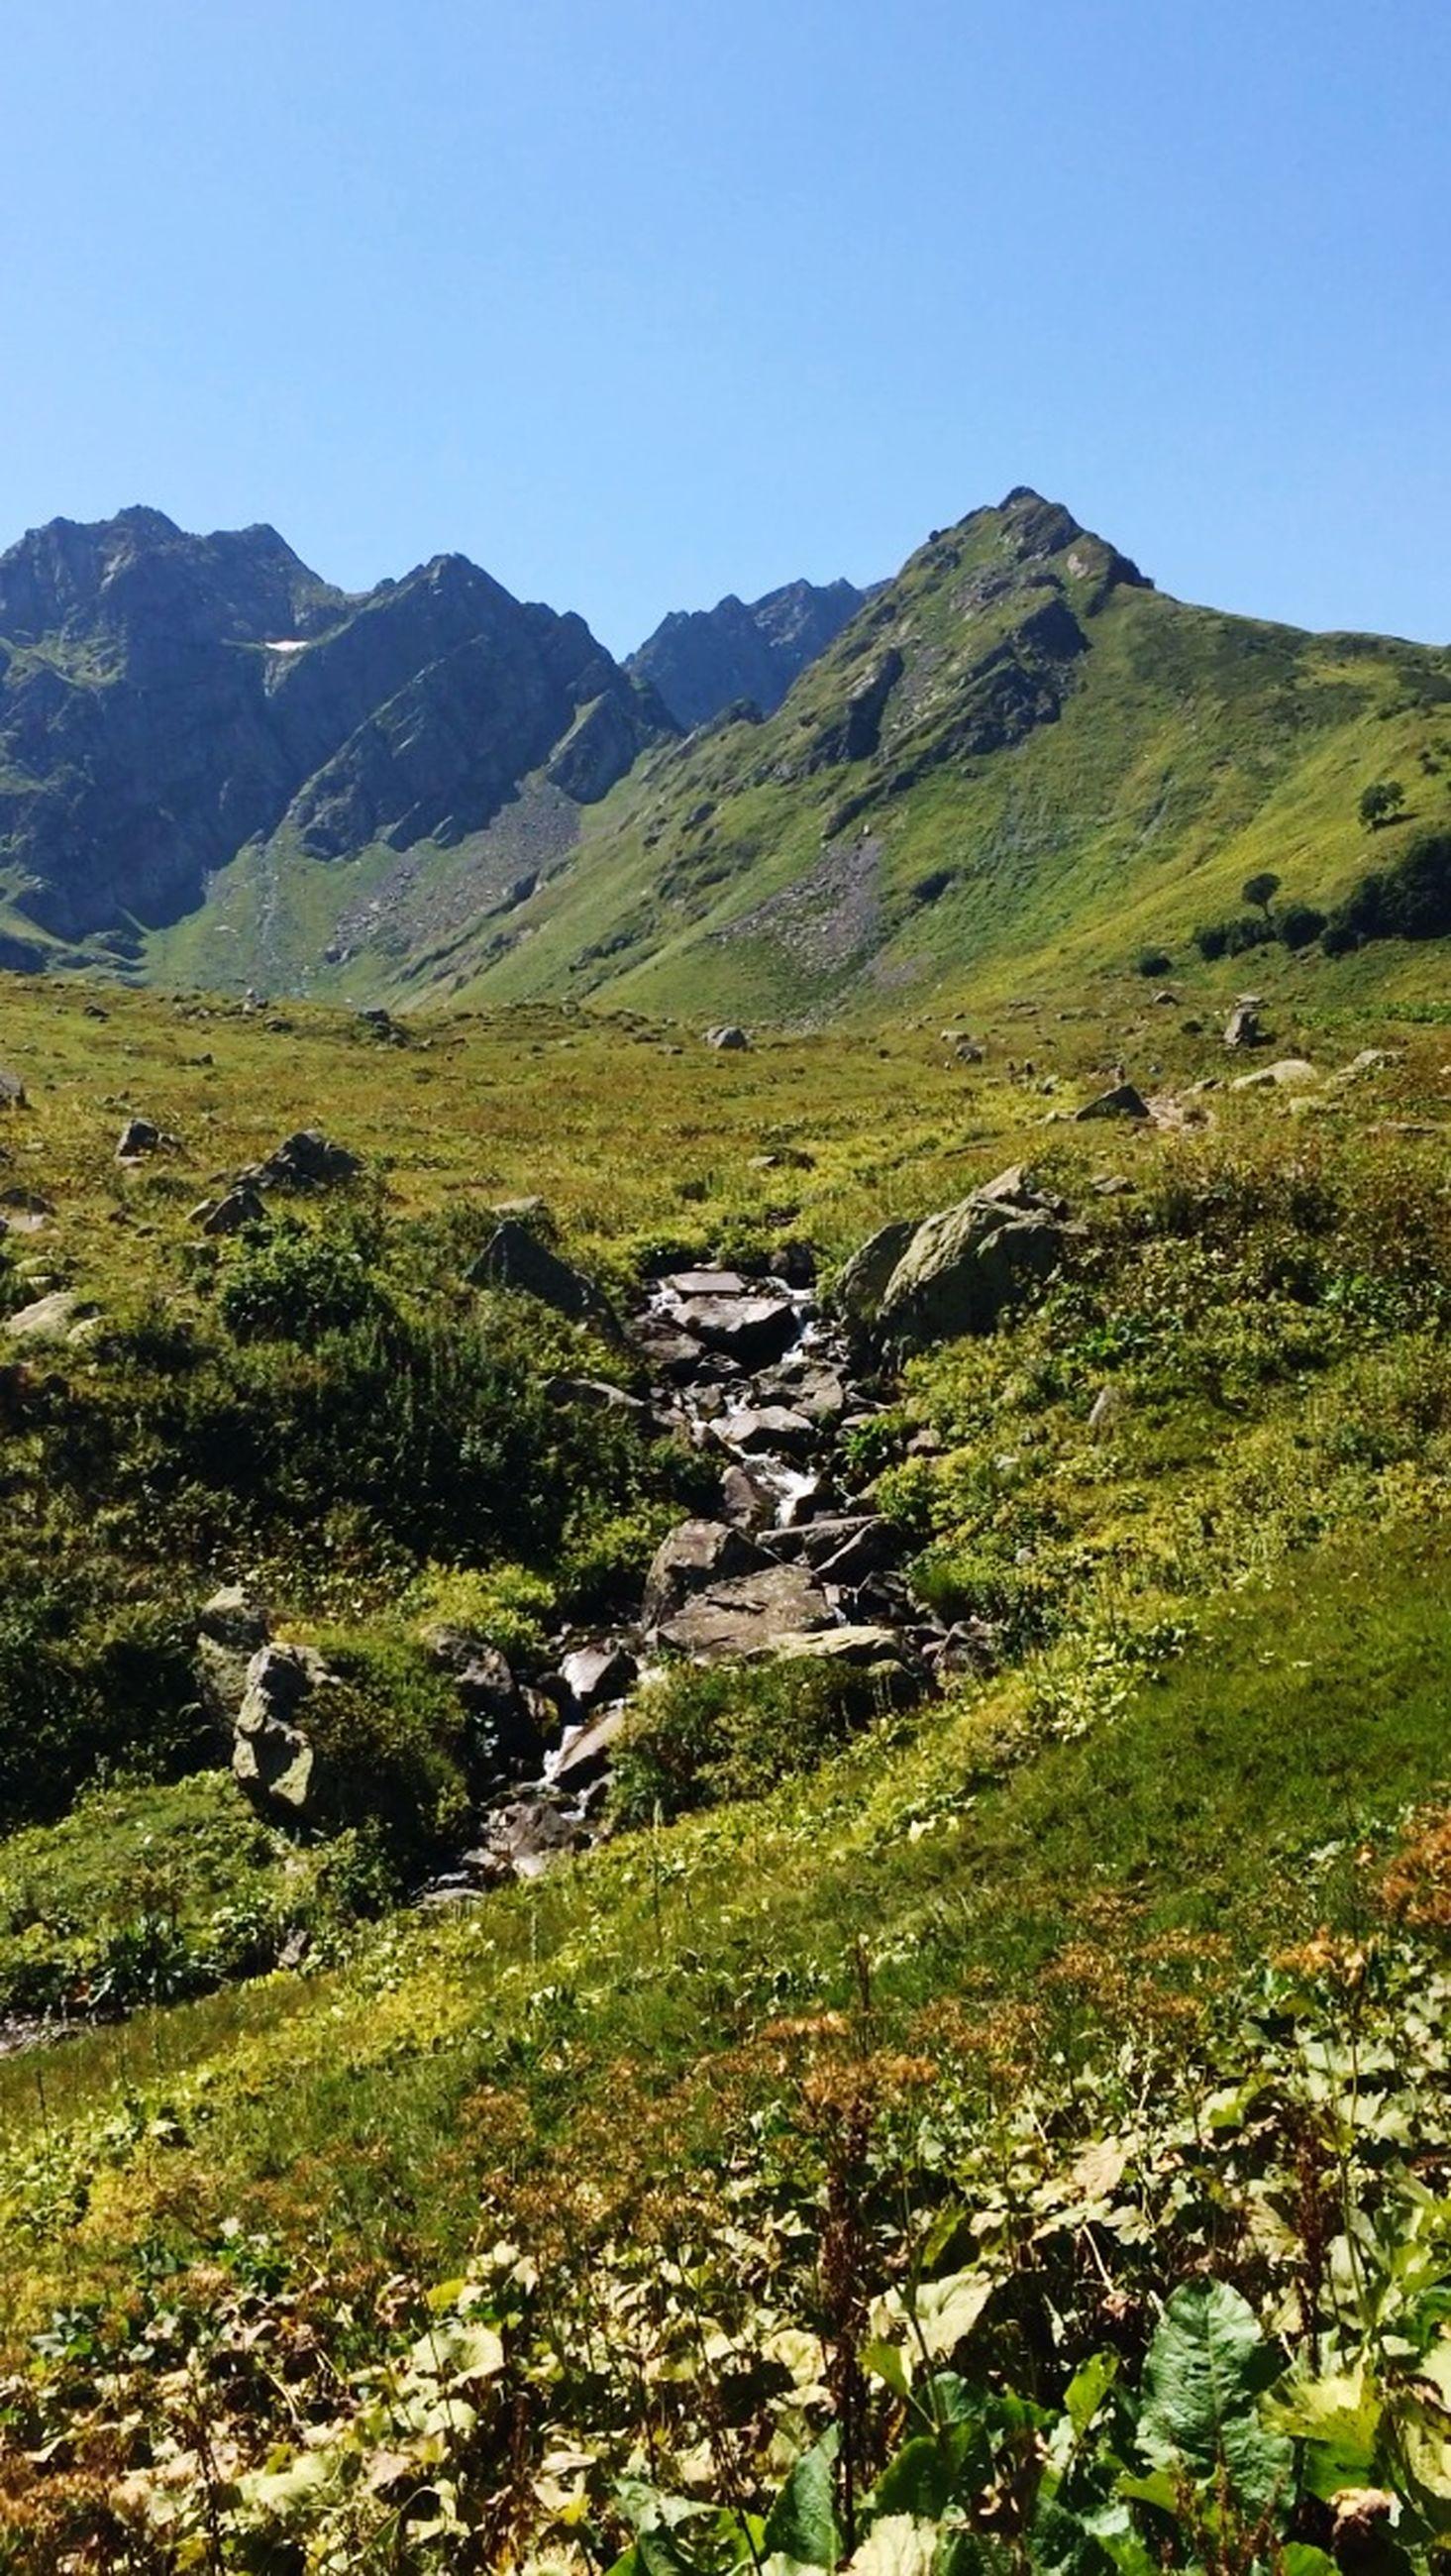 mountain, tranquil scene, grass, landscape, tranquility, clear sky, scenics, beauty in nature, mountain range, nature, non-urban scene, green color, rock - object, field, remote, stream, plant, idyllic, sky, grassy